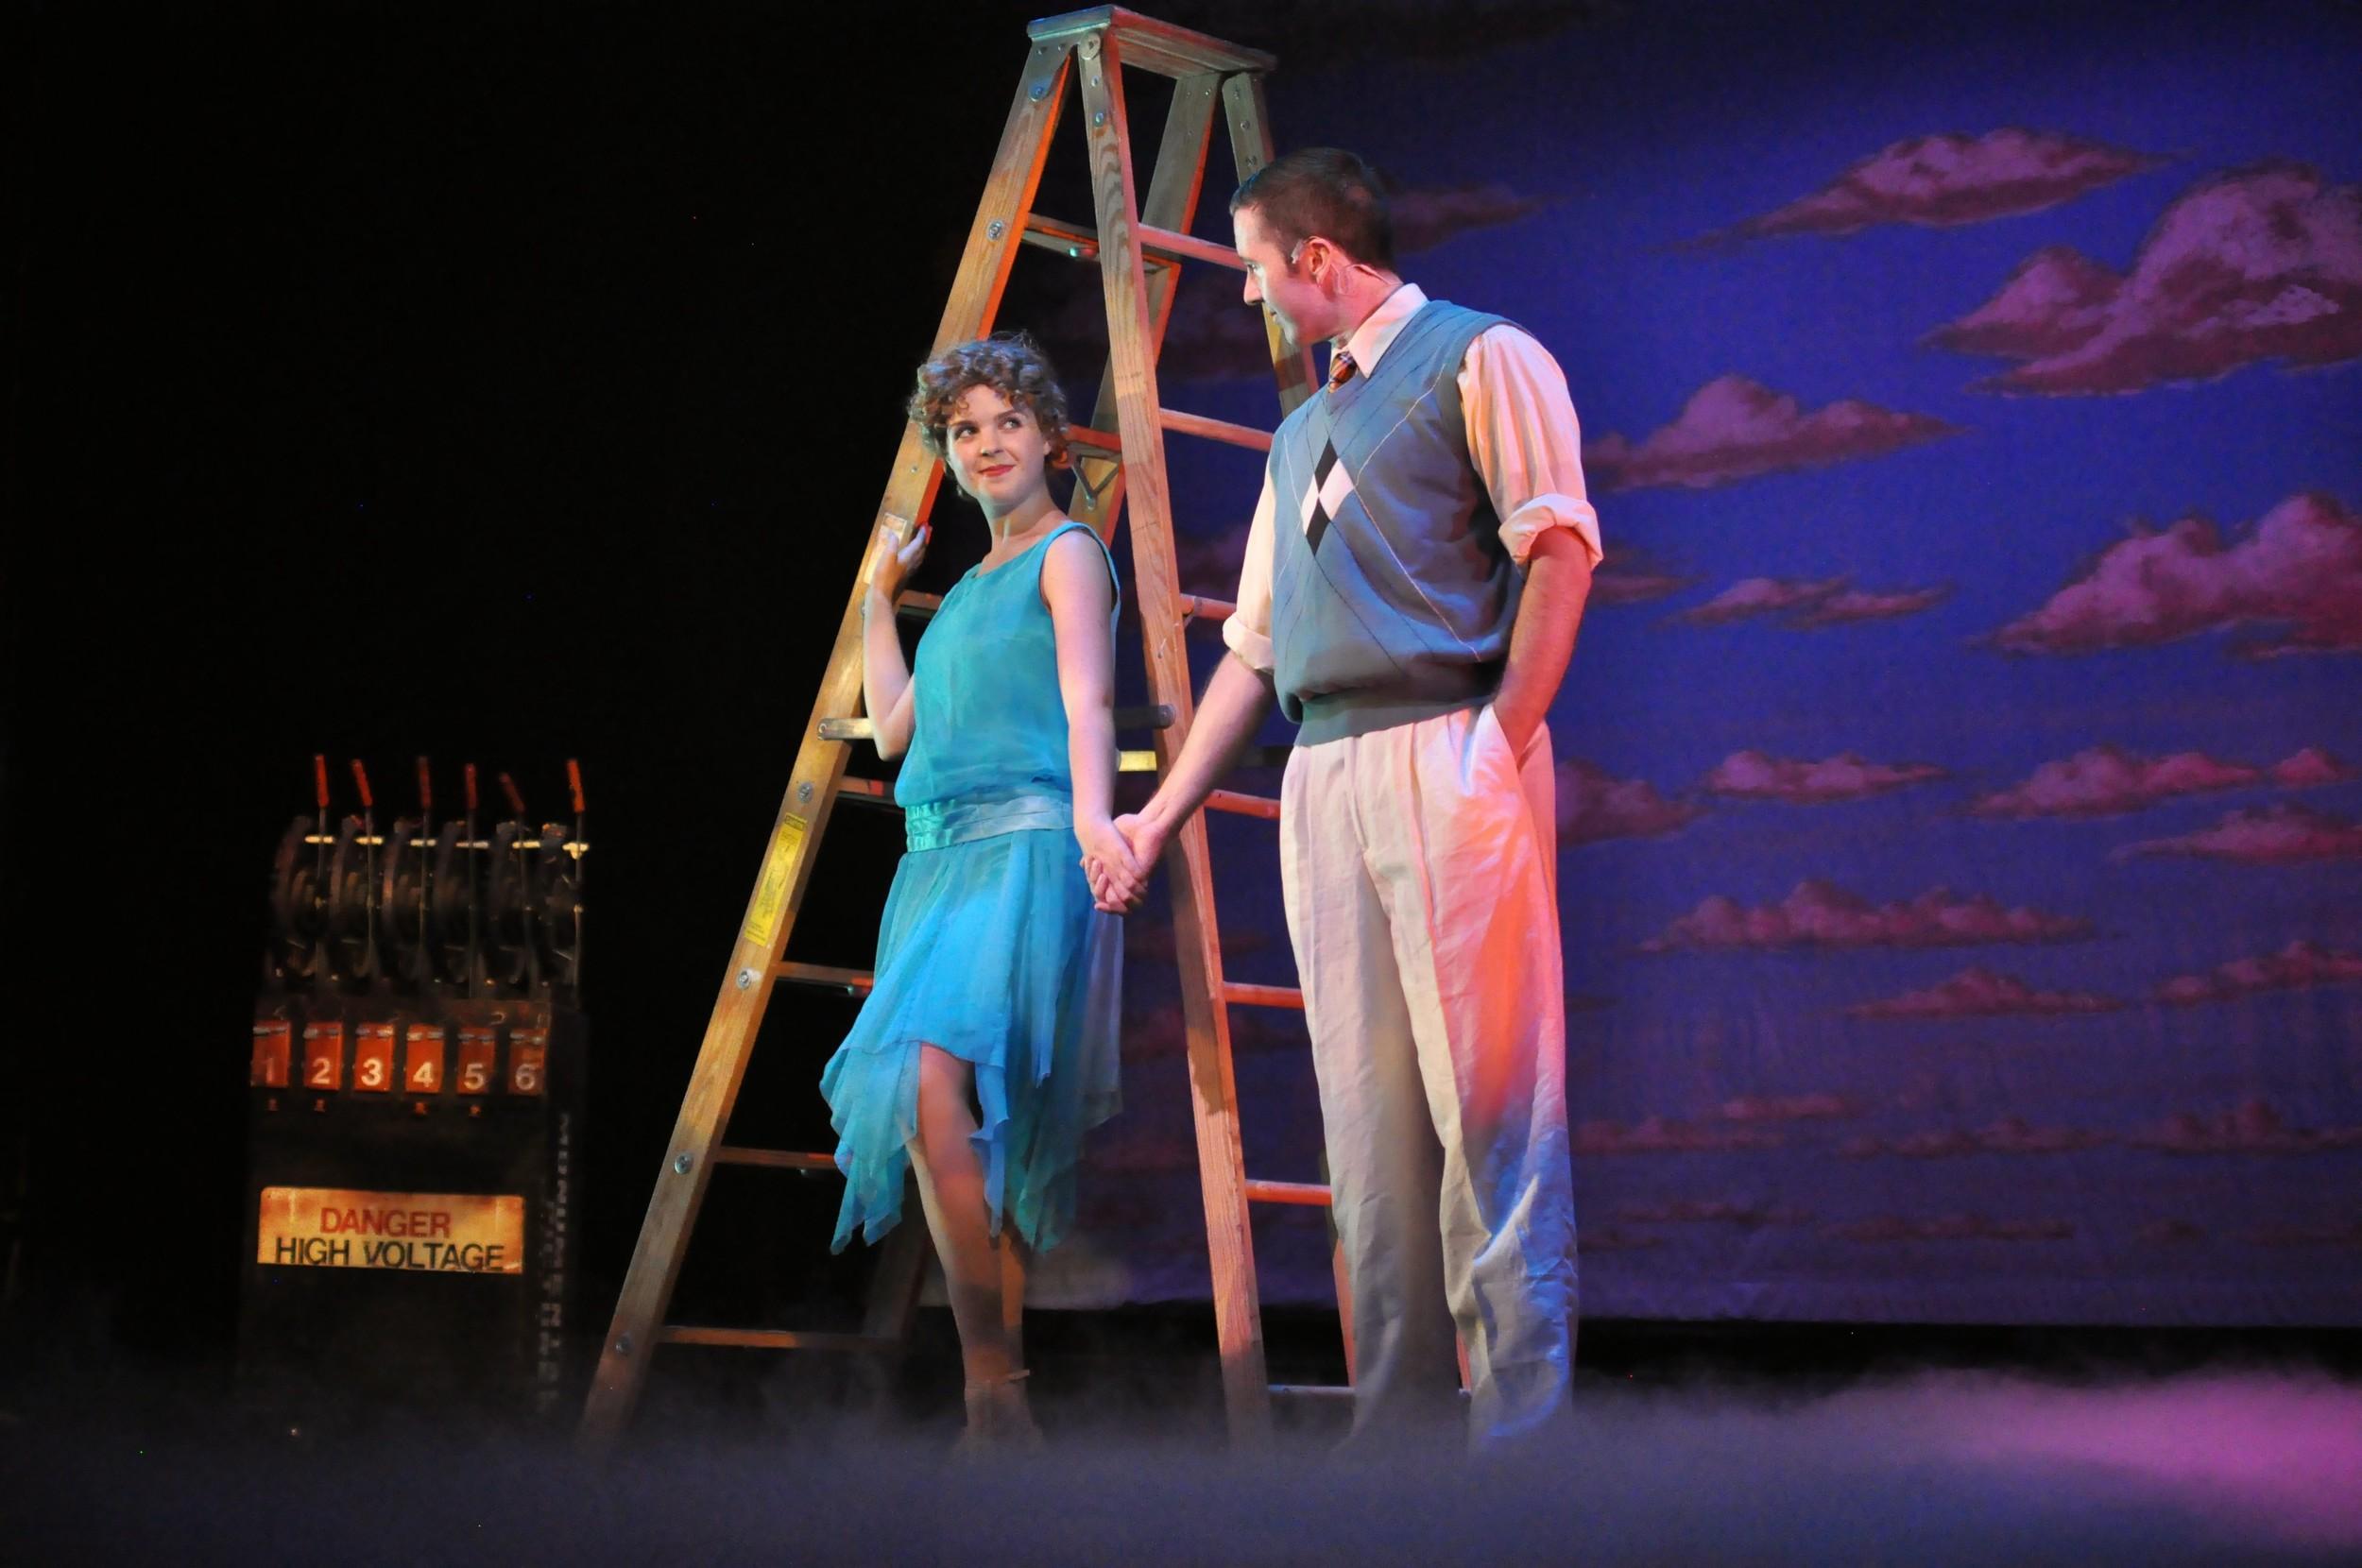 Gillian Mariner Gordon with Sean Quinn in   Singin' in the Rain  at  Reagle Music Theatre of Greater Boston  (Photo Credit:  Herb Philpott ).